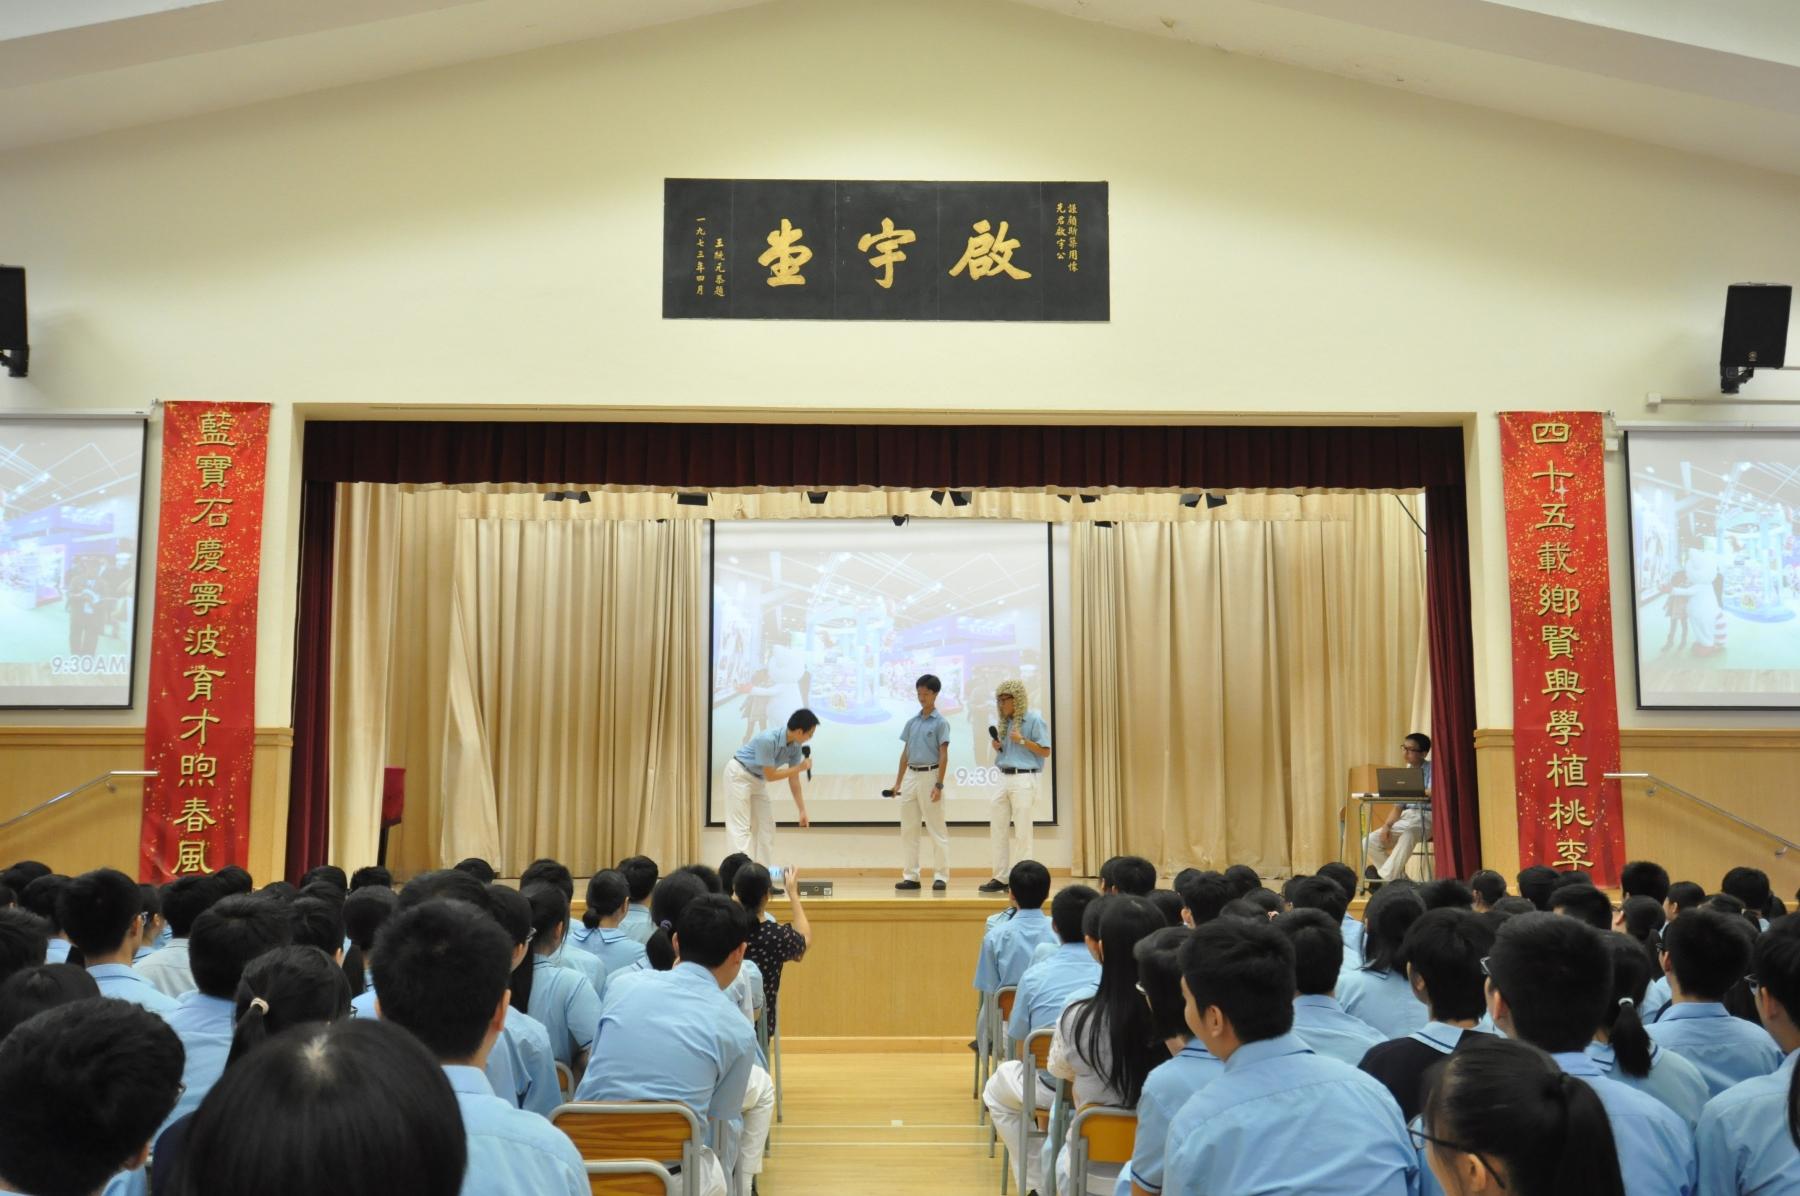 http://www.npc.edu.hk/sites/default/files/dsc_0034.jpg